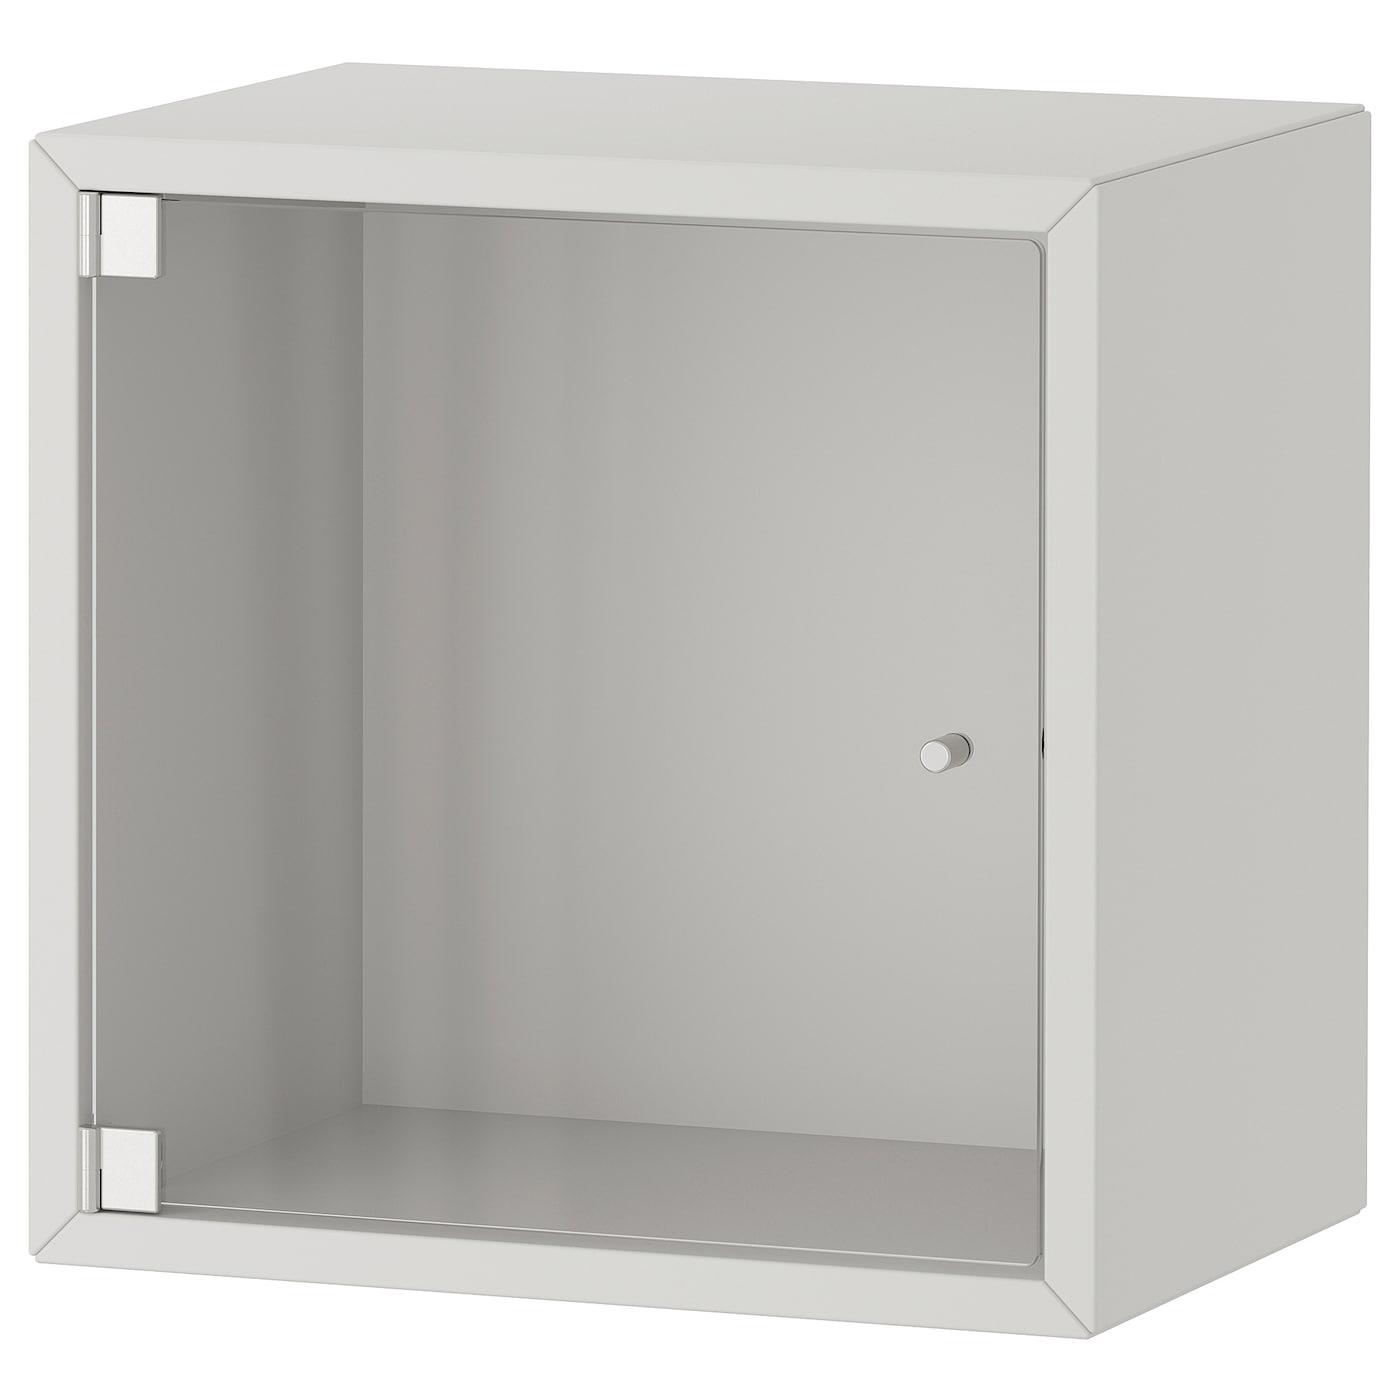 EKET Wall cabinet with glass door - light grey - IKEA